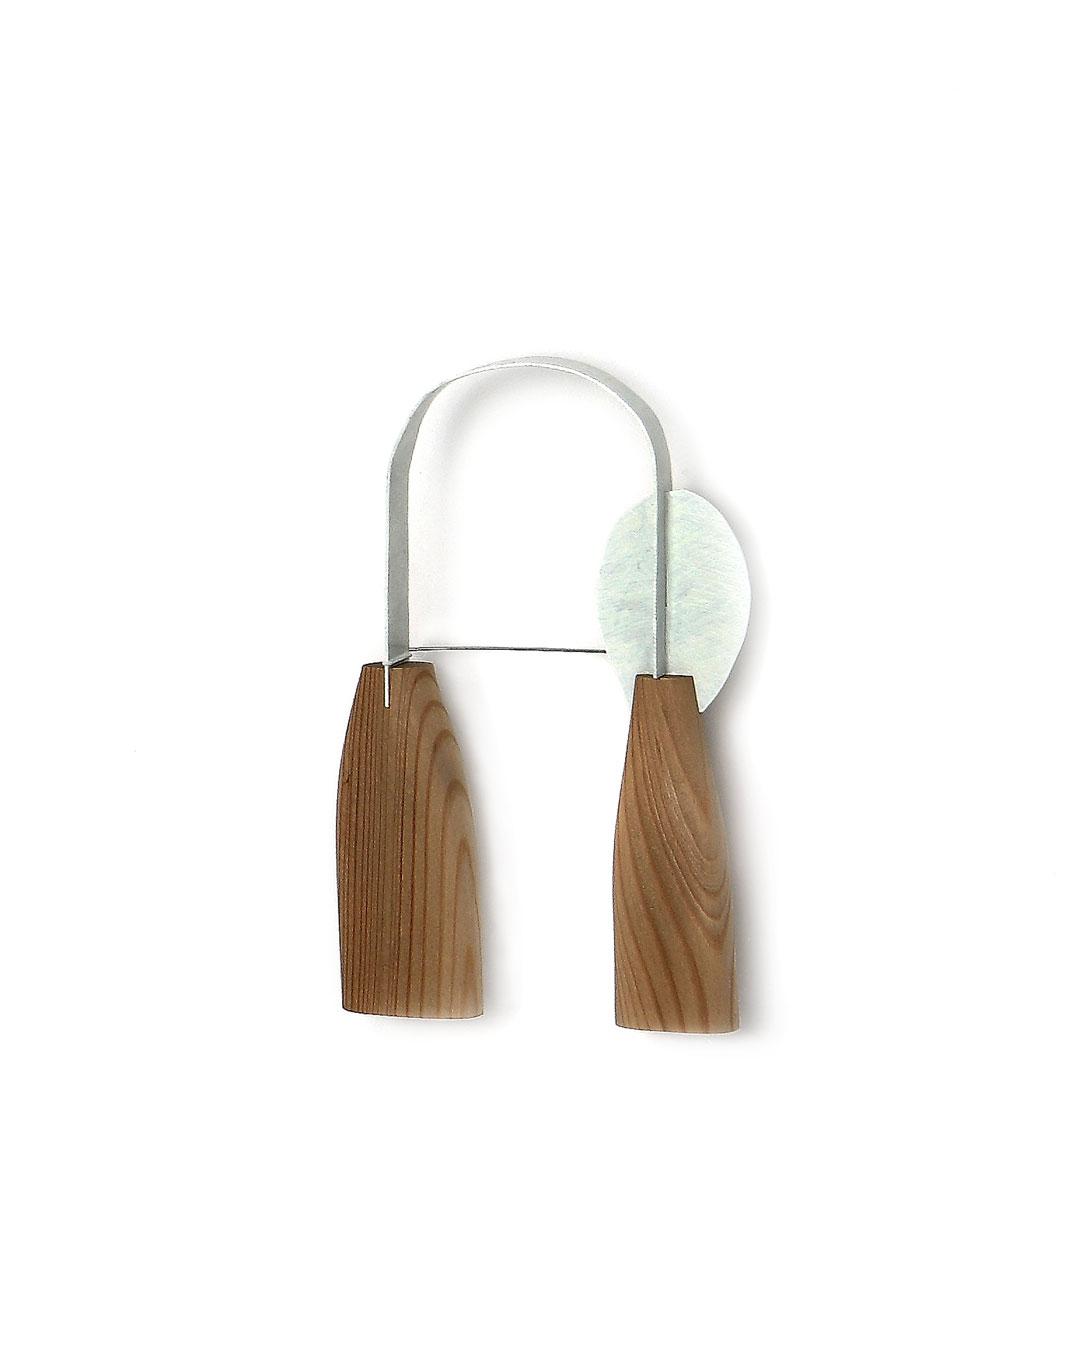 Dongchun Lee, Heart, 2009, brooch; wood, iron, paint, 93 x 150 x 17 mm, €1090